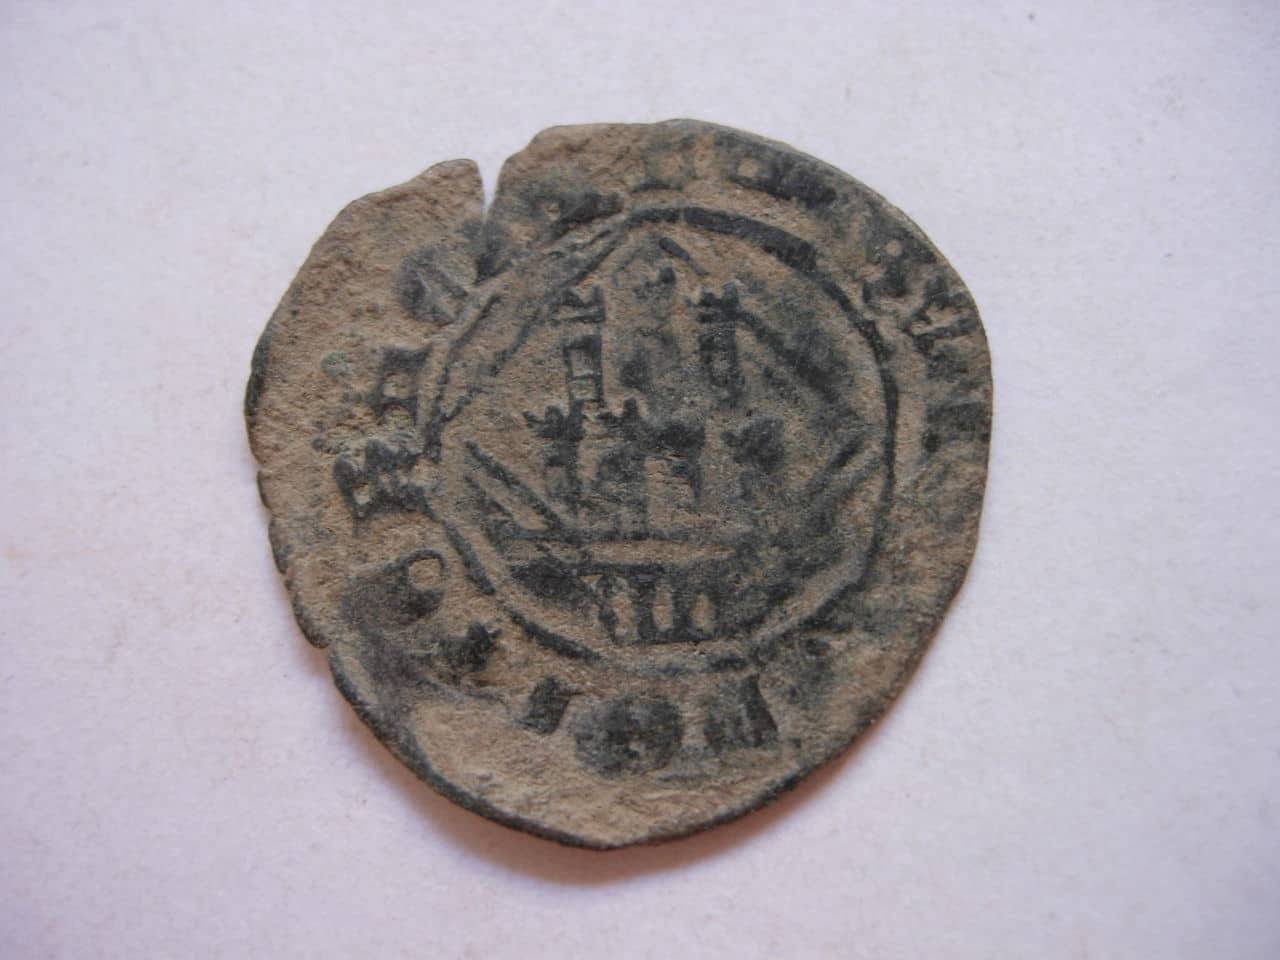 Blanca del ordenamiento de Segovia de 1471. Enrique IV. Segovia. Baj_139